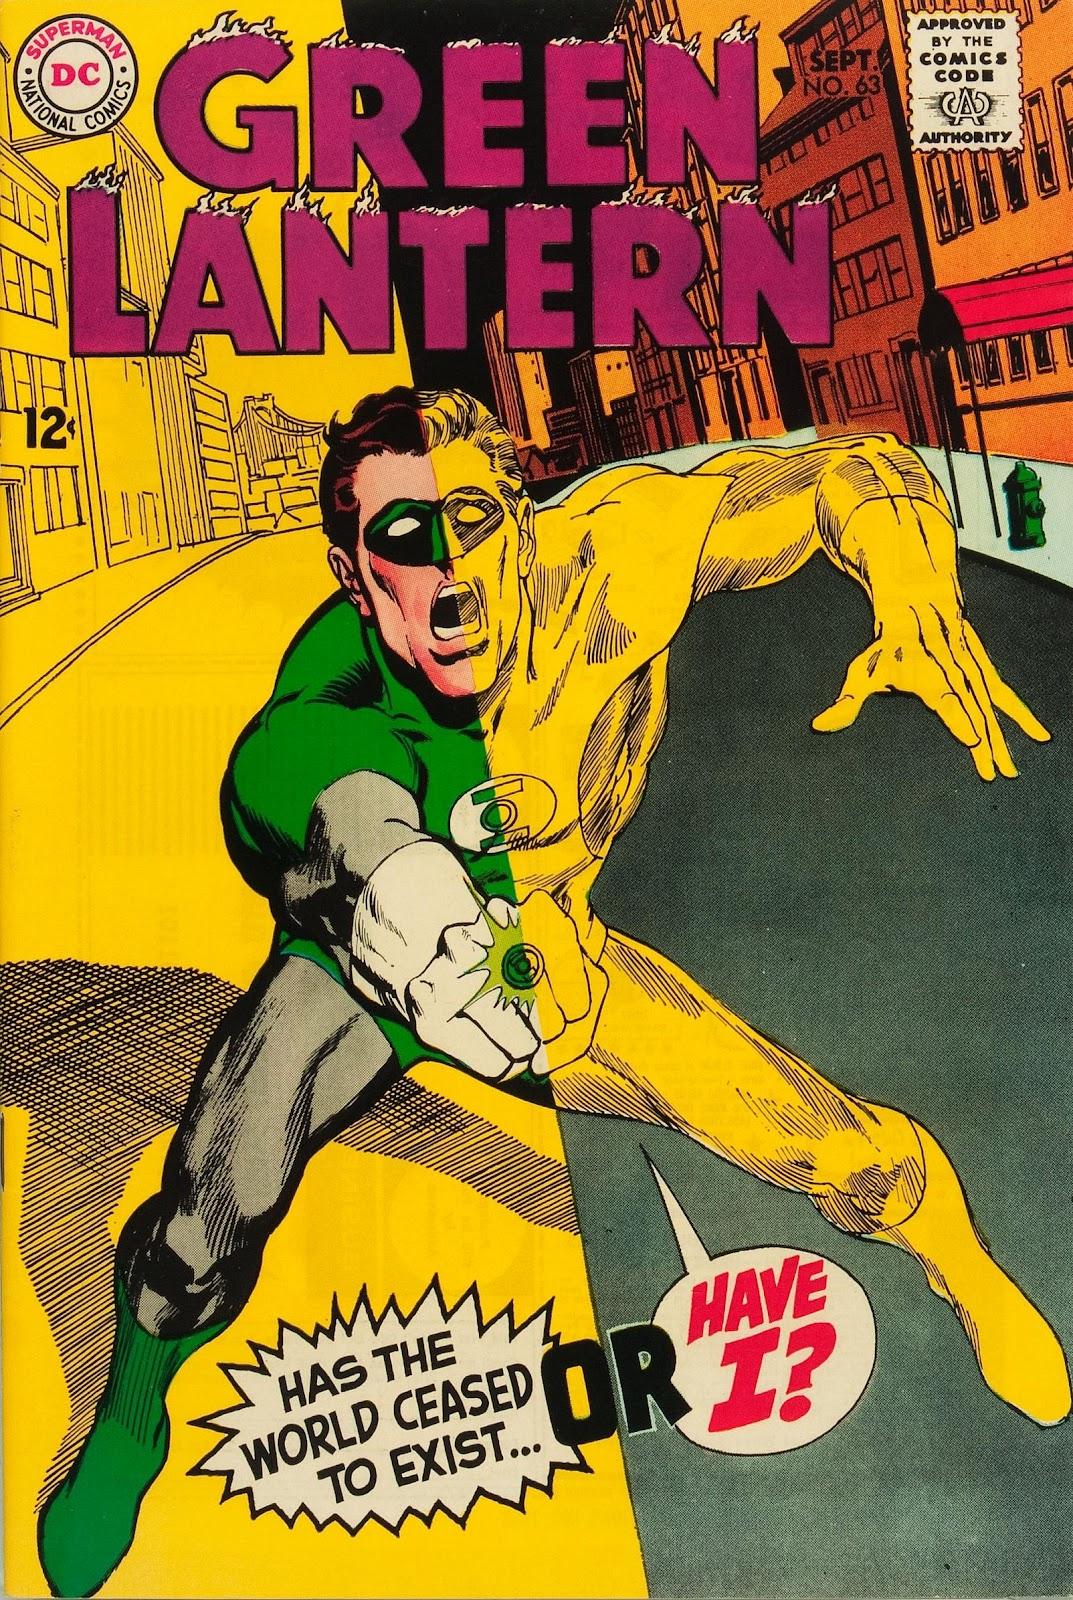 Cap'n's Comics: Neal Adams Rocks!